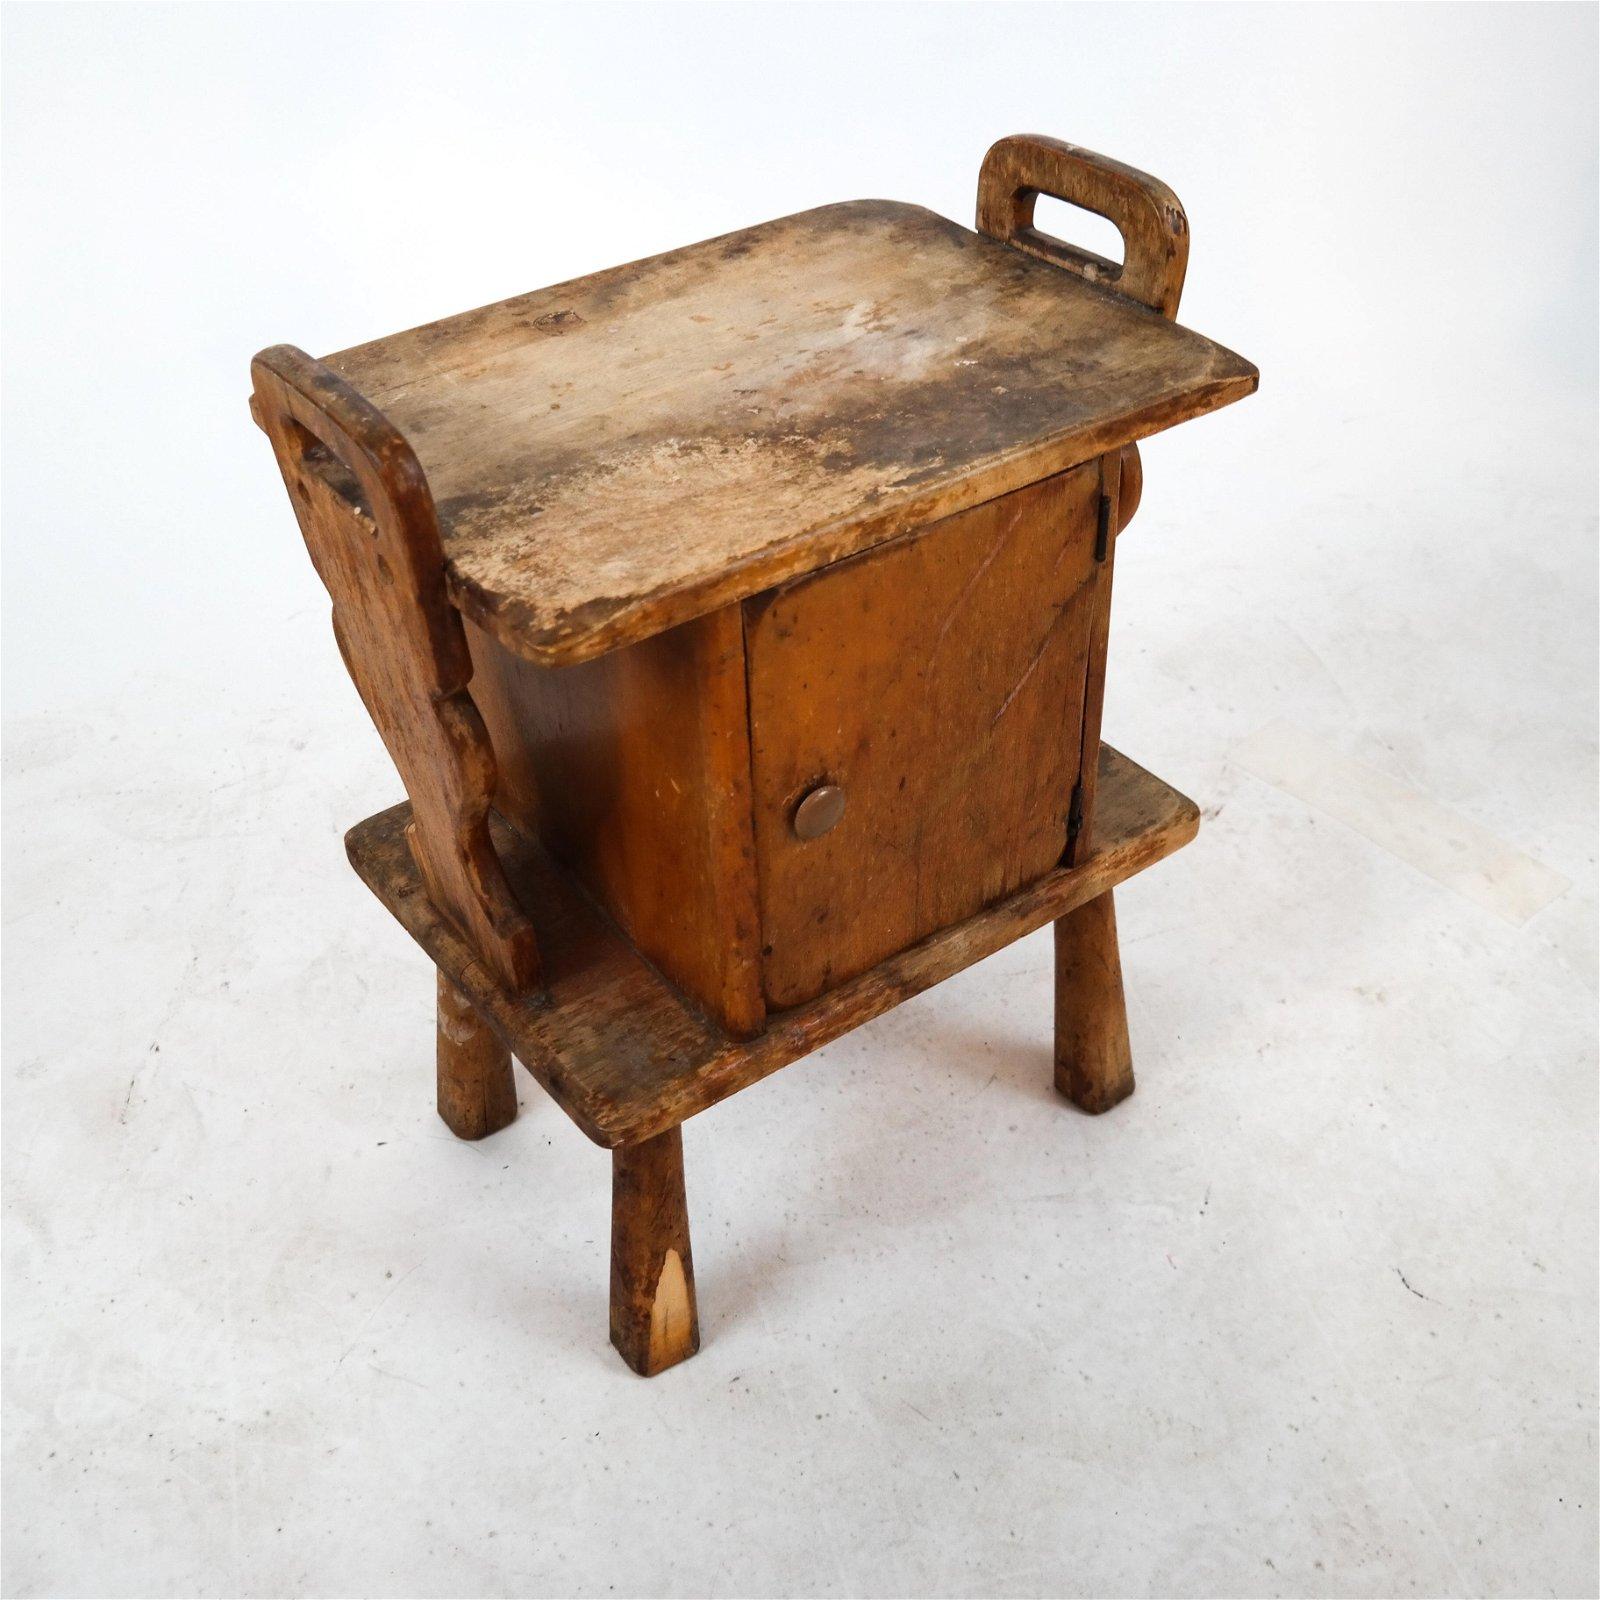 Rustic Antique Pine Cupboard/Stand